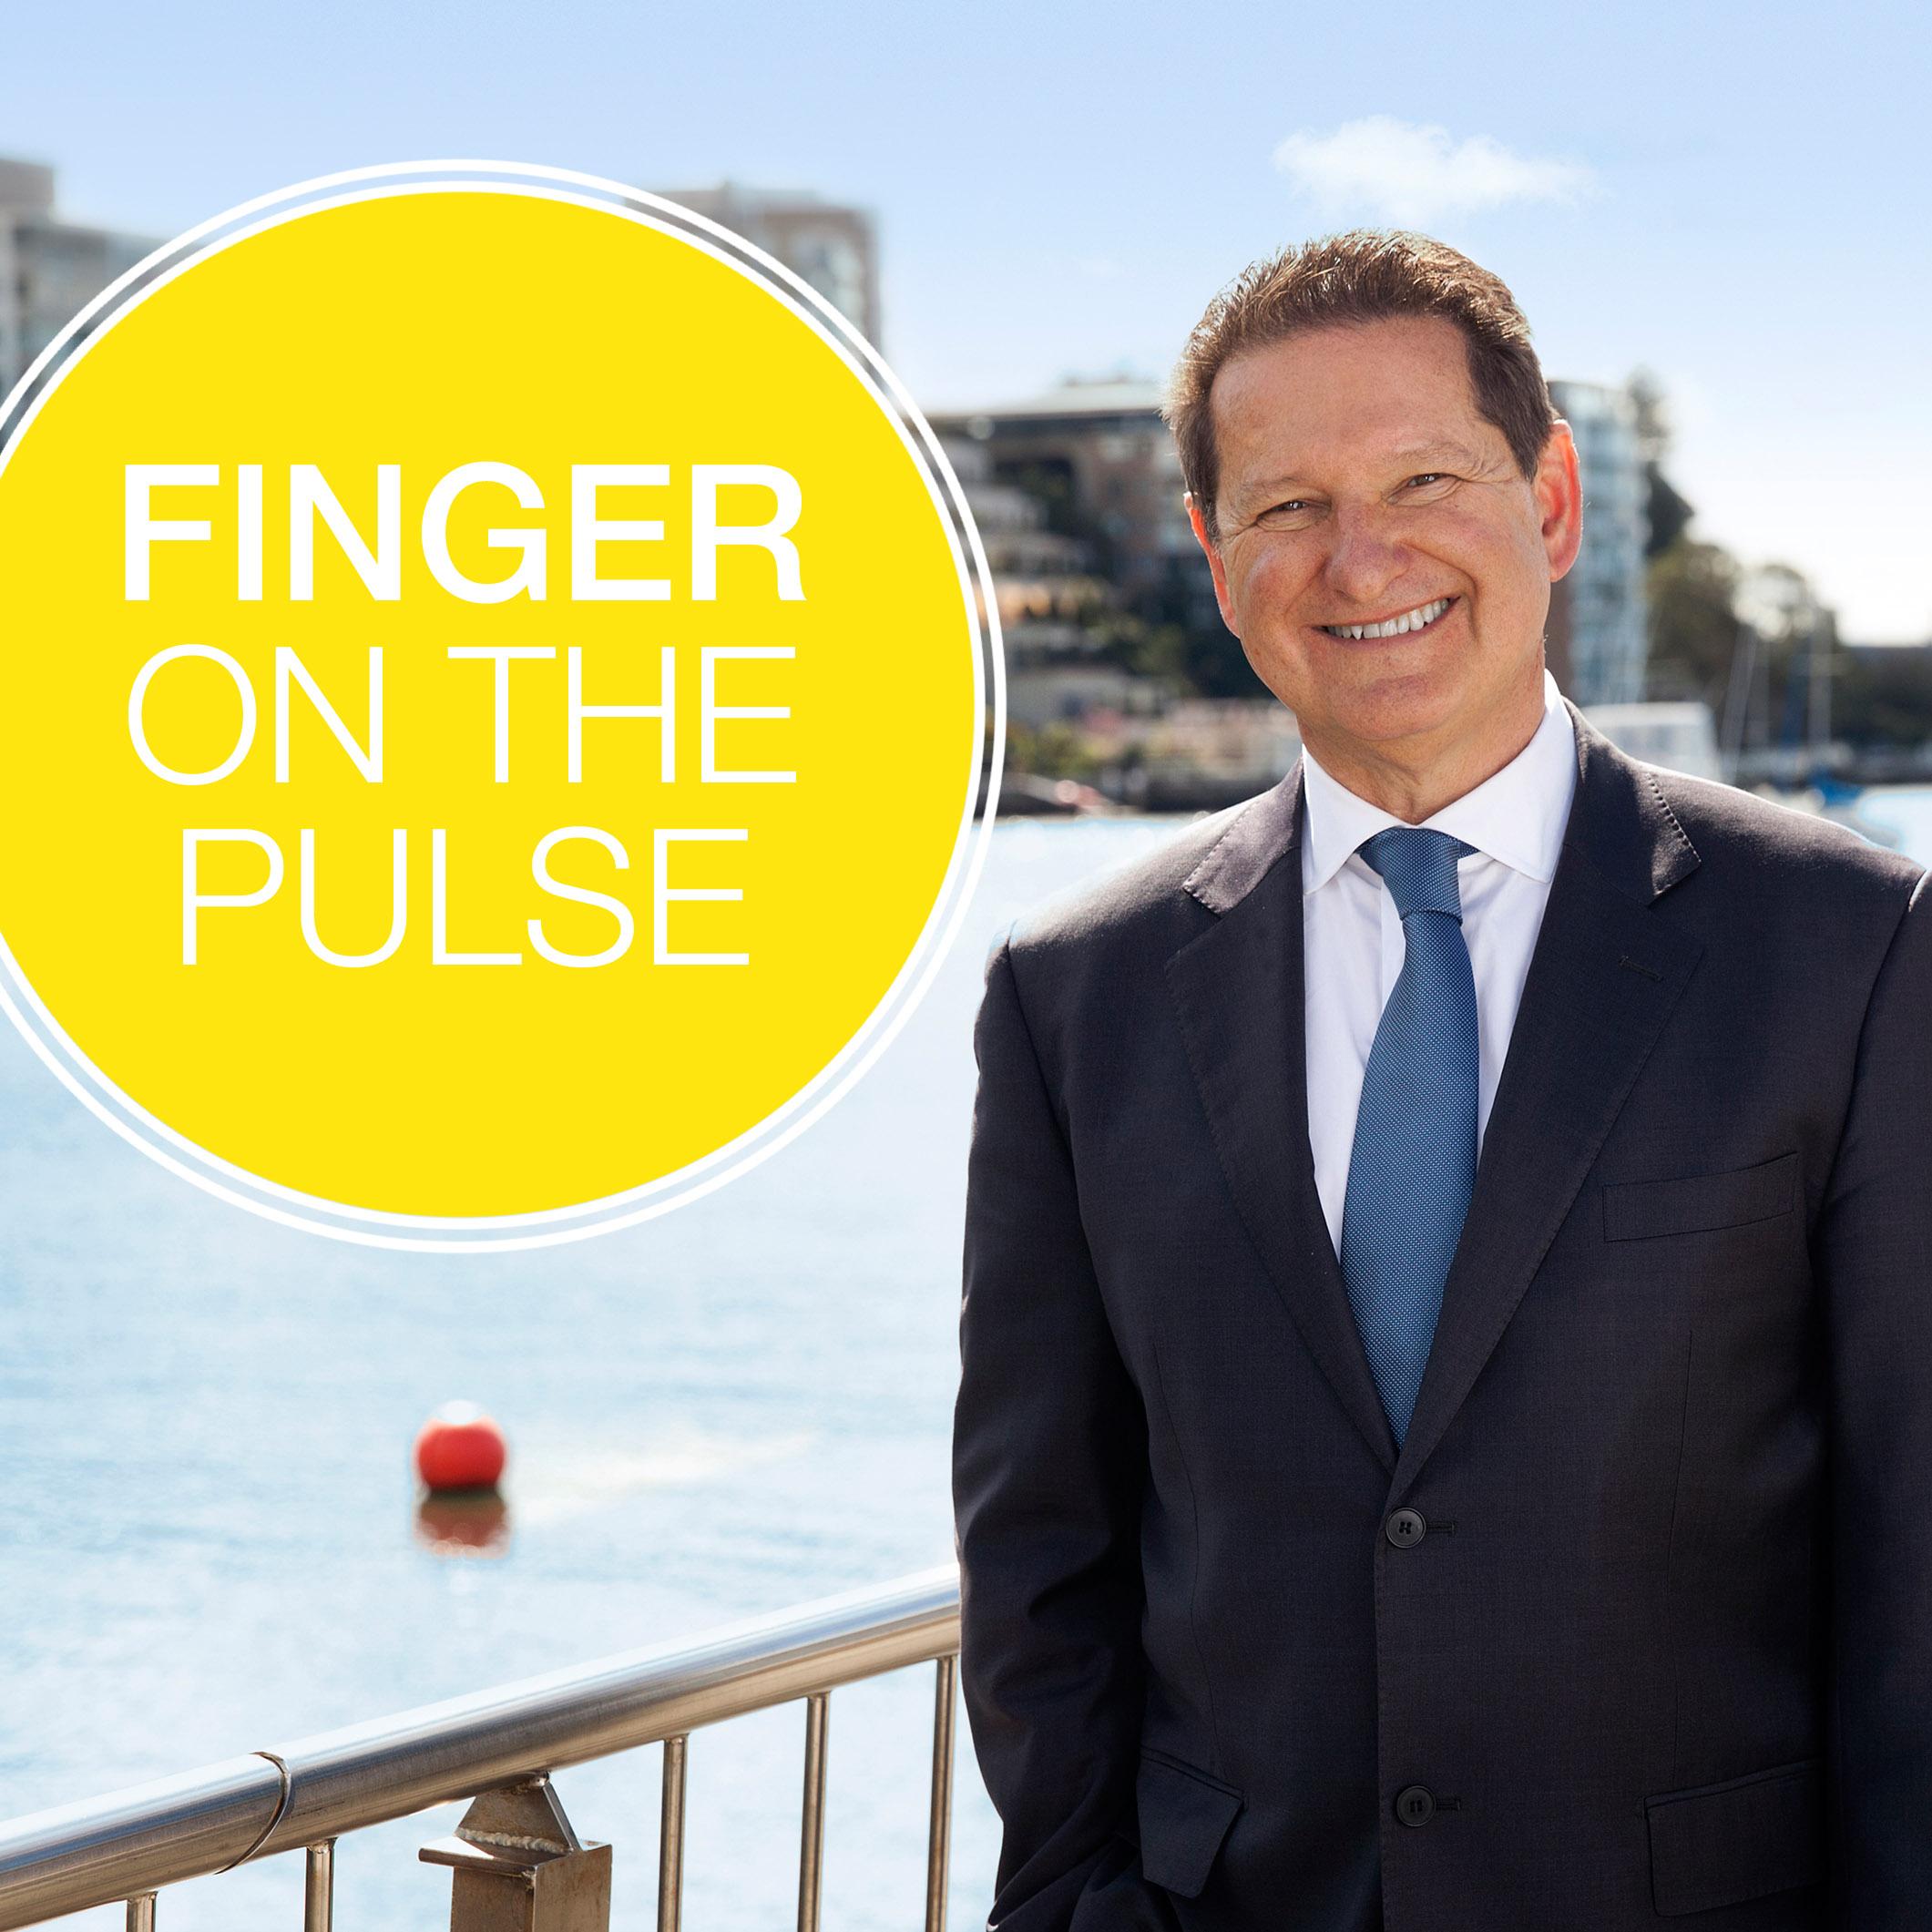 Finger on the pulse